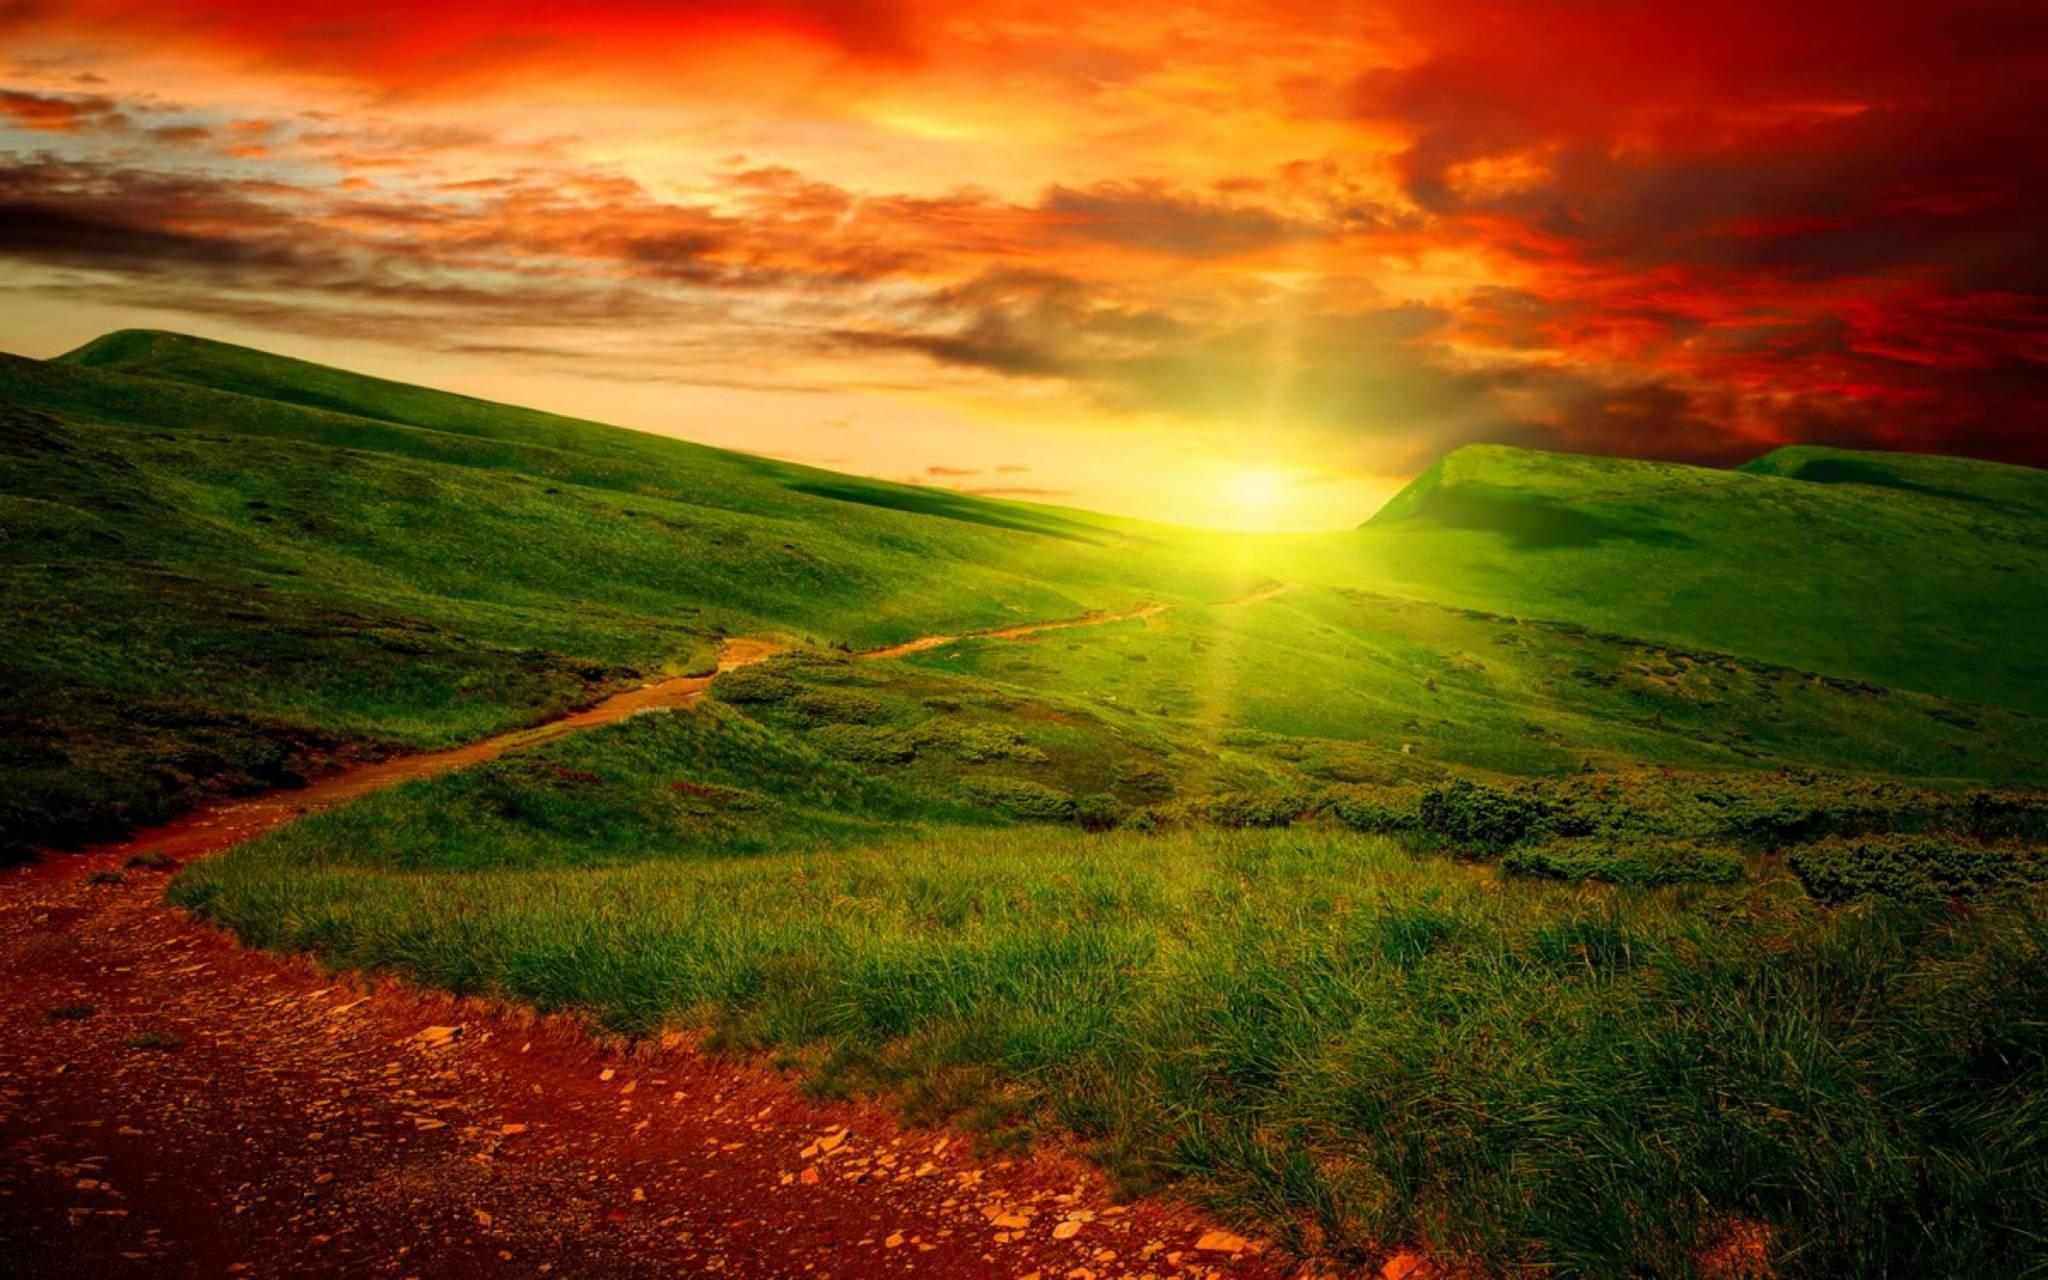 hd natures sunset